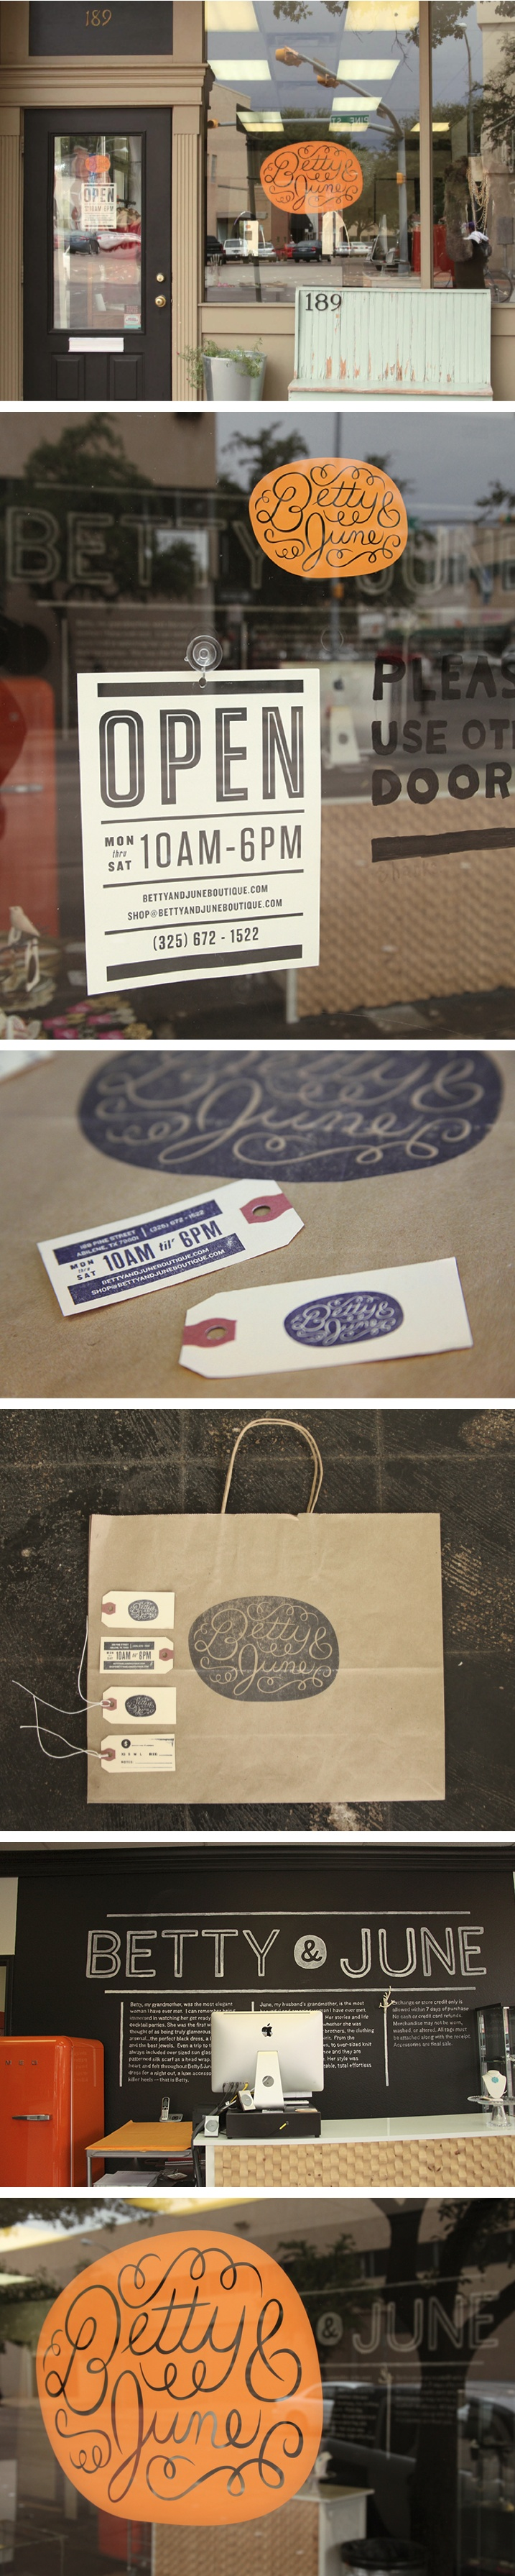 Betty & June branding by Ryan Feerer #shop #window #sign #logo #branding